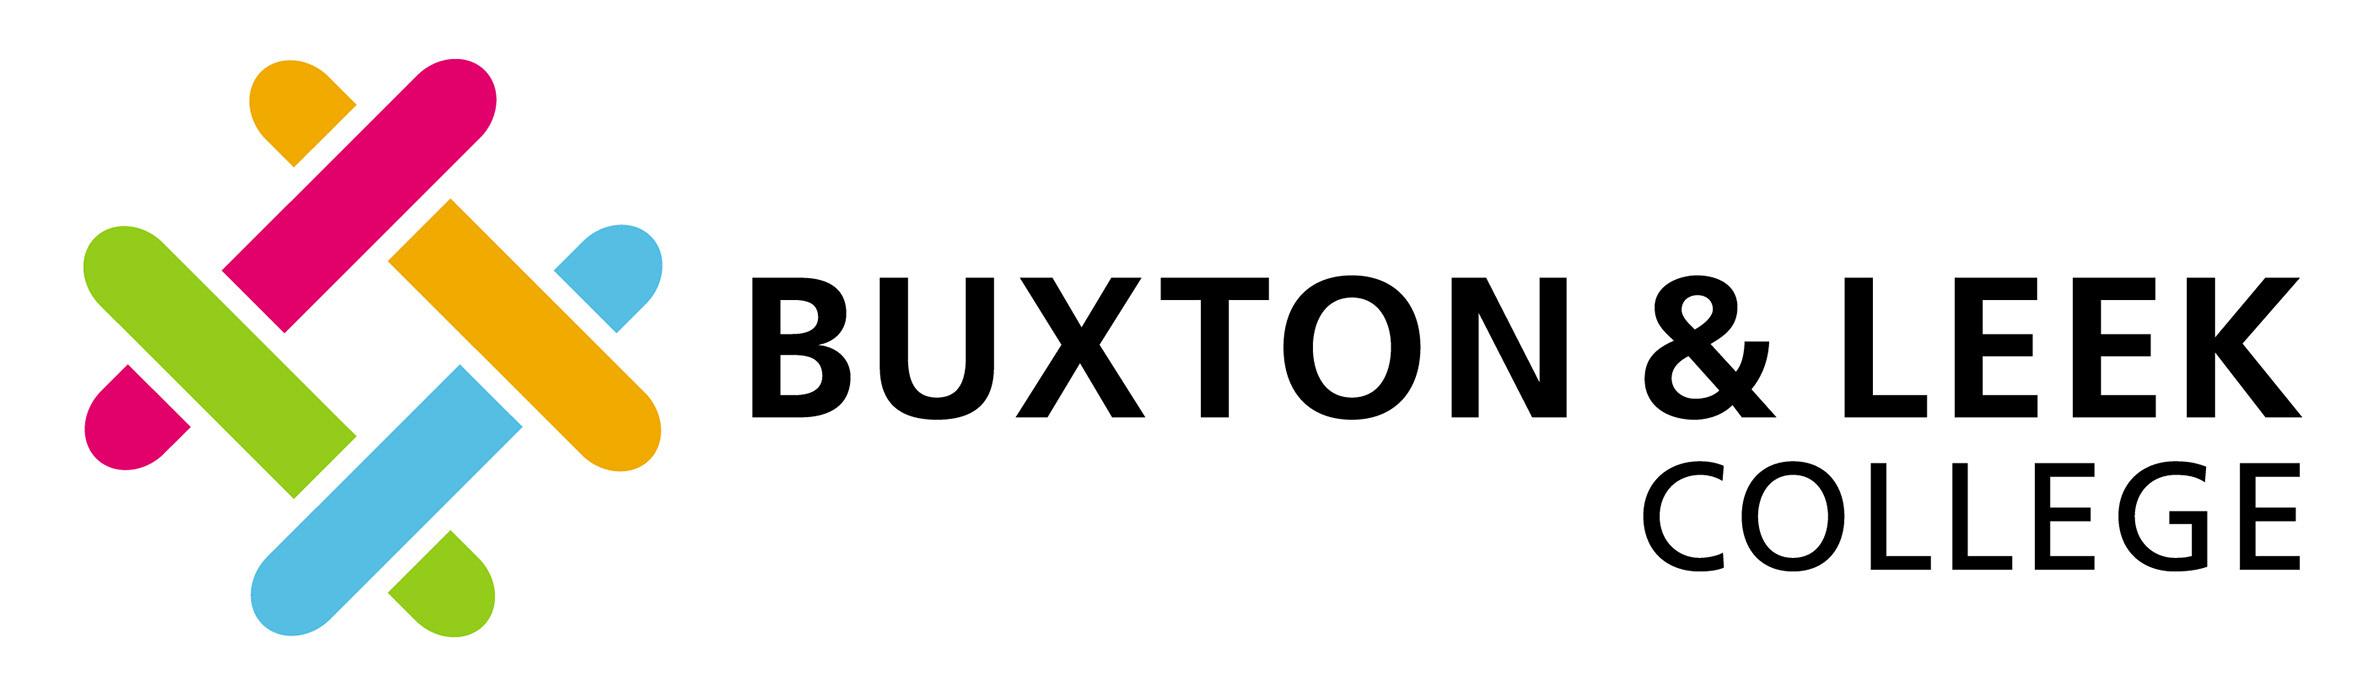 Buxton And Leek College Logo Jpeg